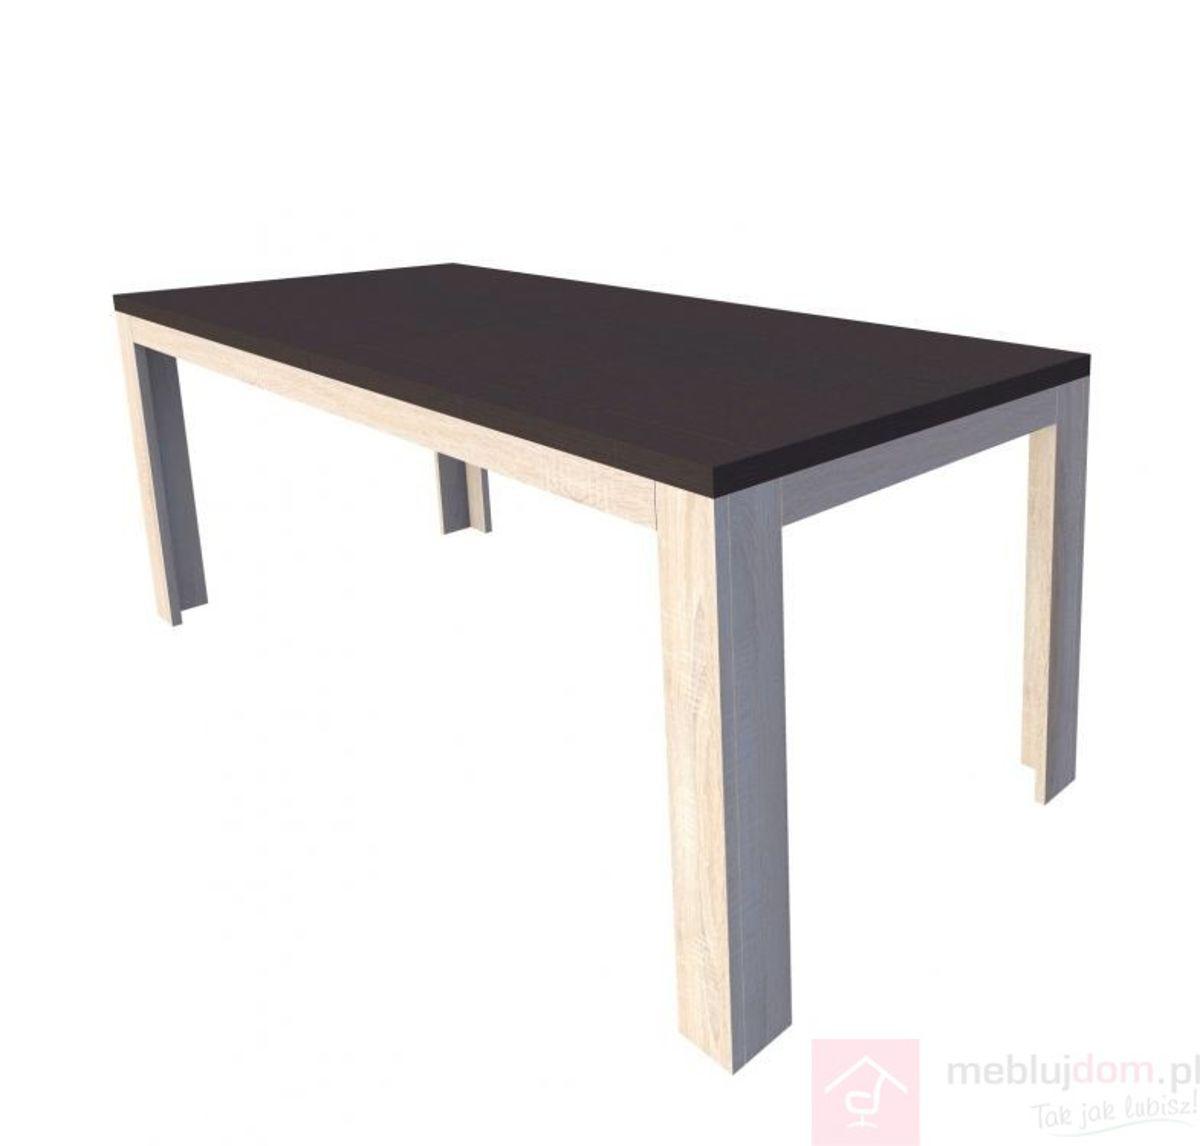 Stół LAURA LA-Stół 2